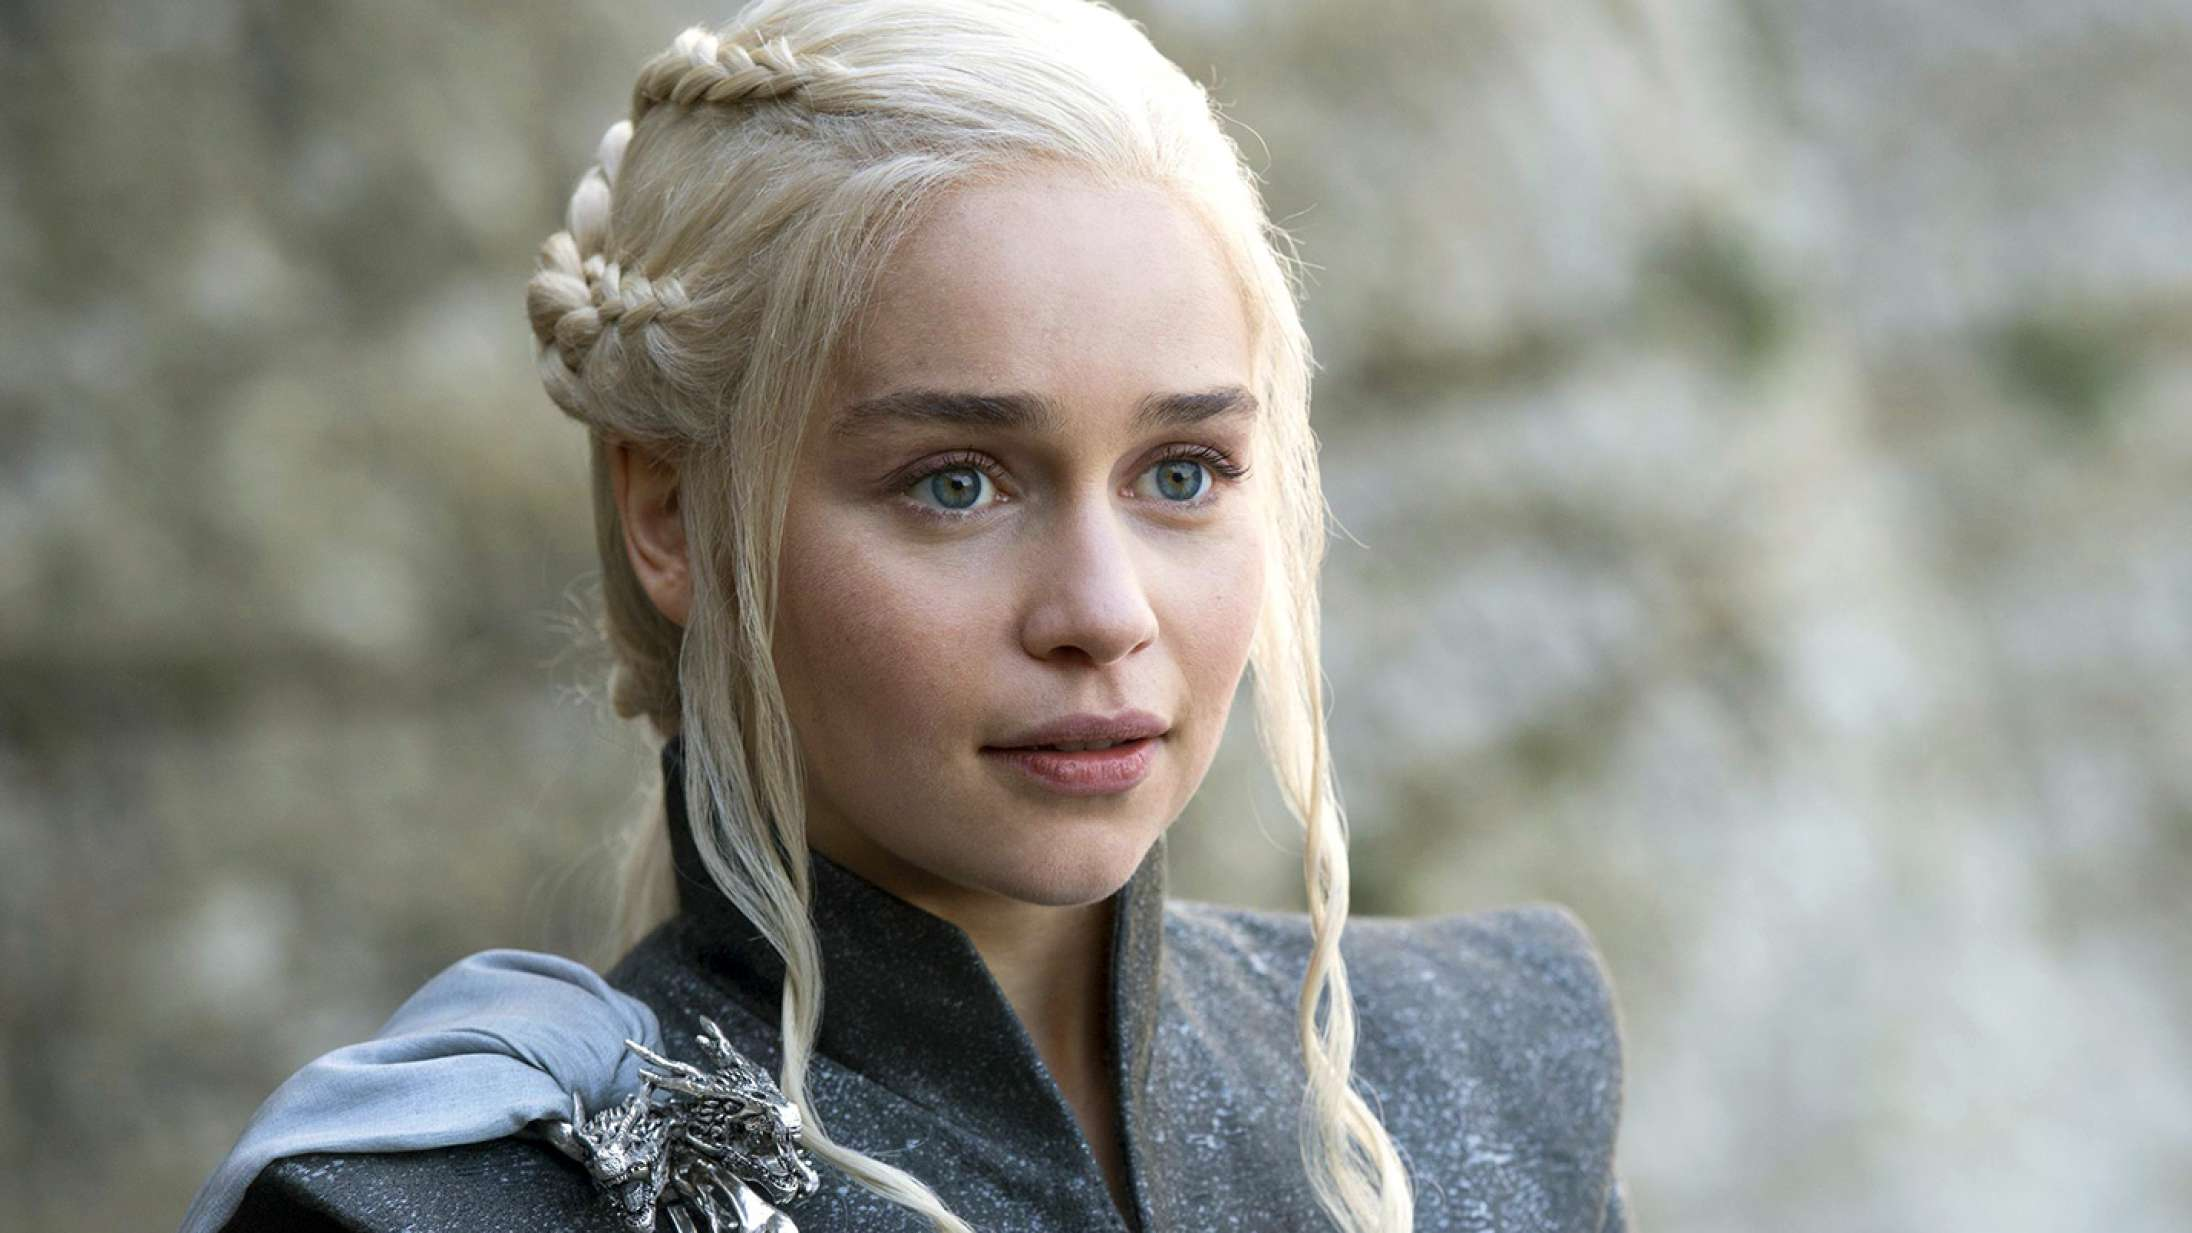 Emilia Clarke »lavede robotten« ved sin 'Game of Thrones'-audition – fik rollen 10 sekunder efter